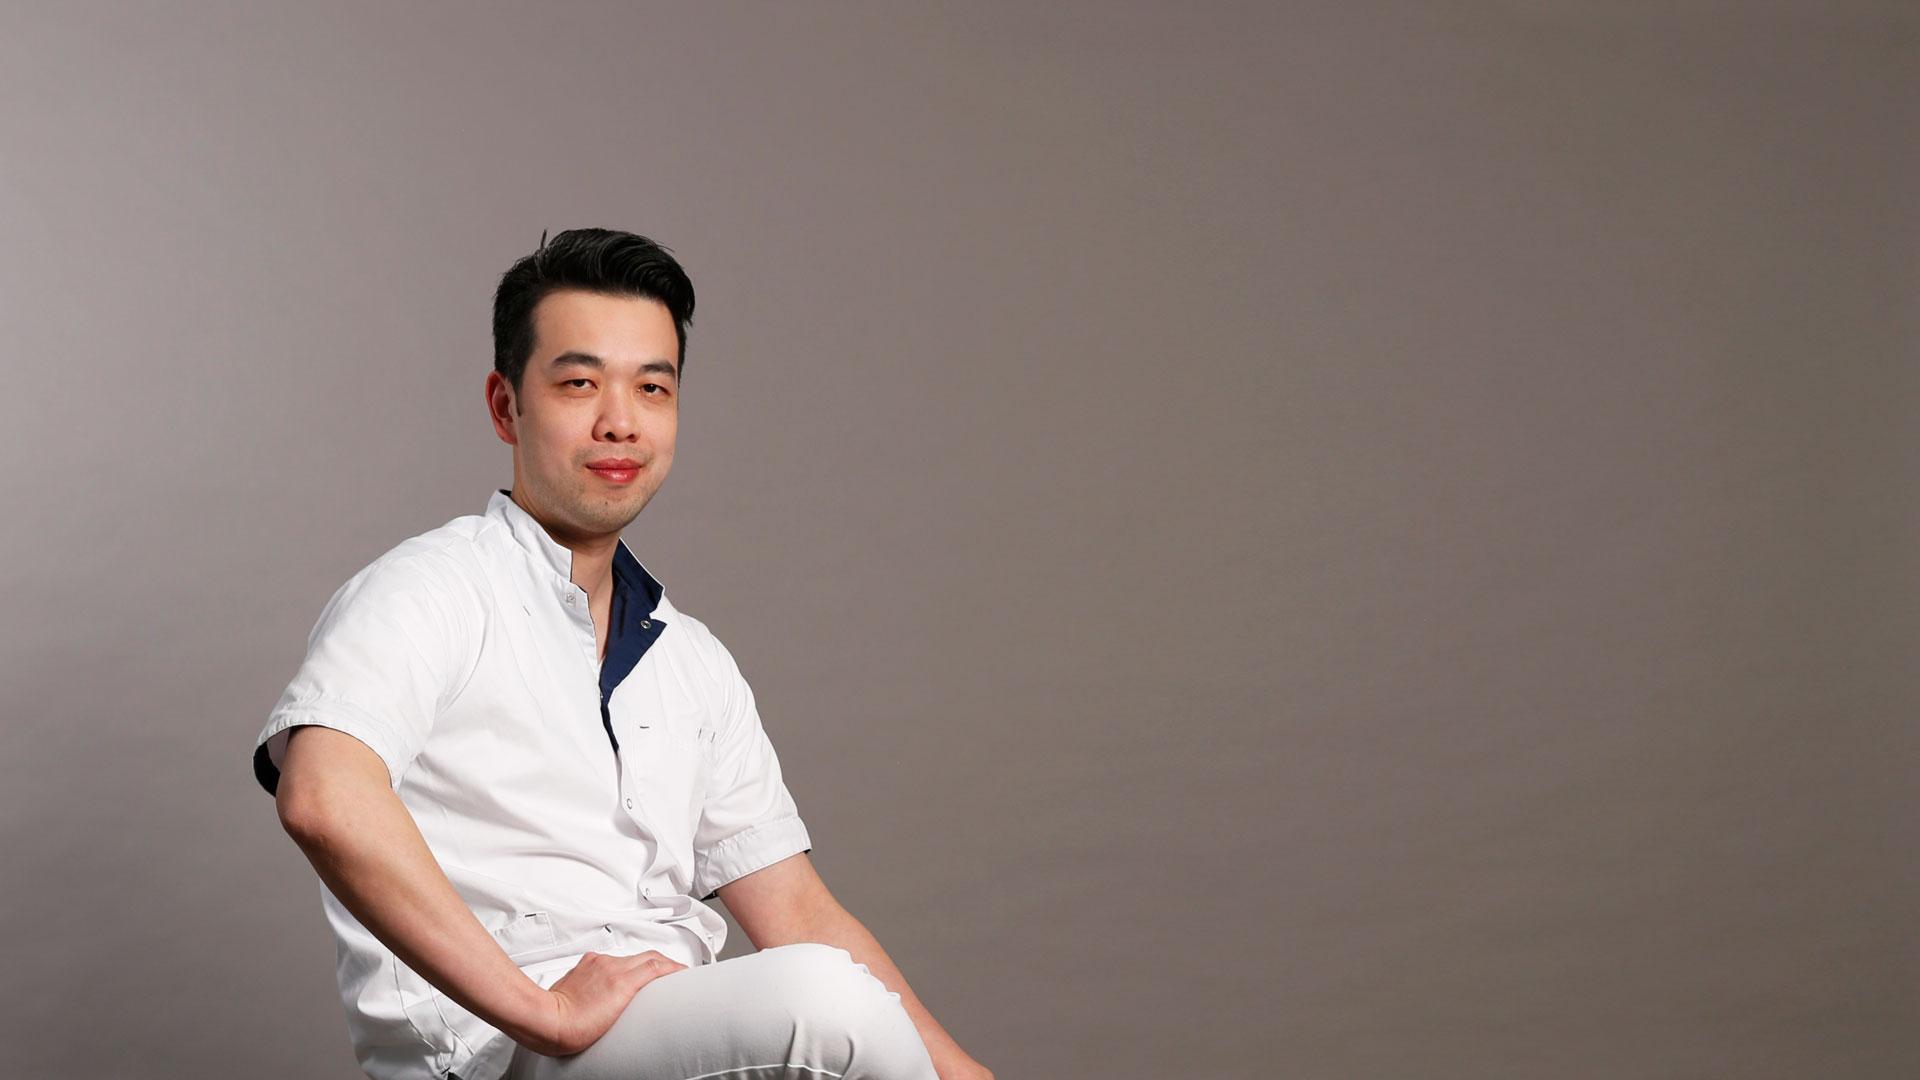 Dr. Wing Yuen